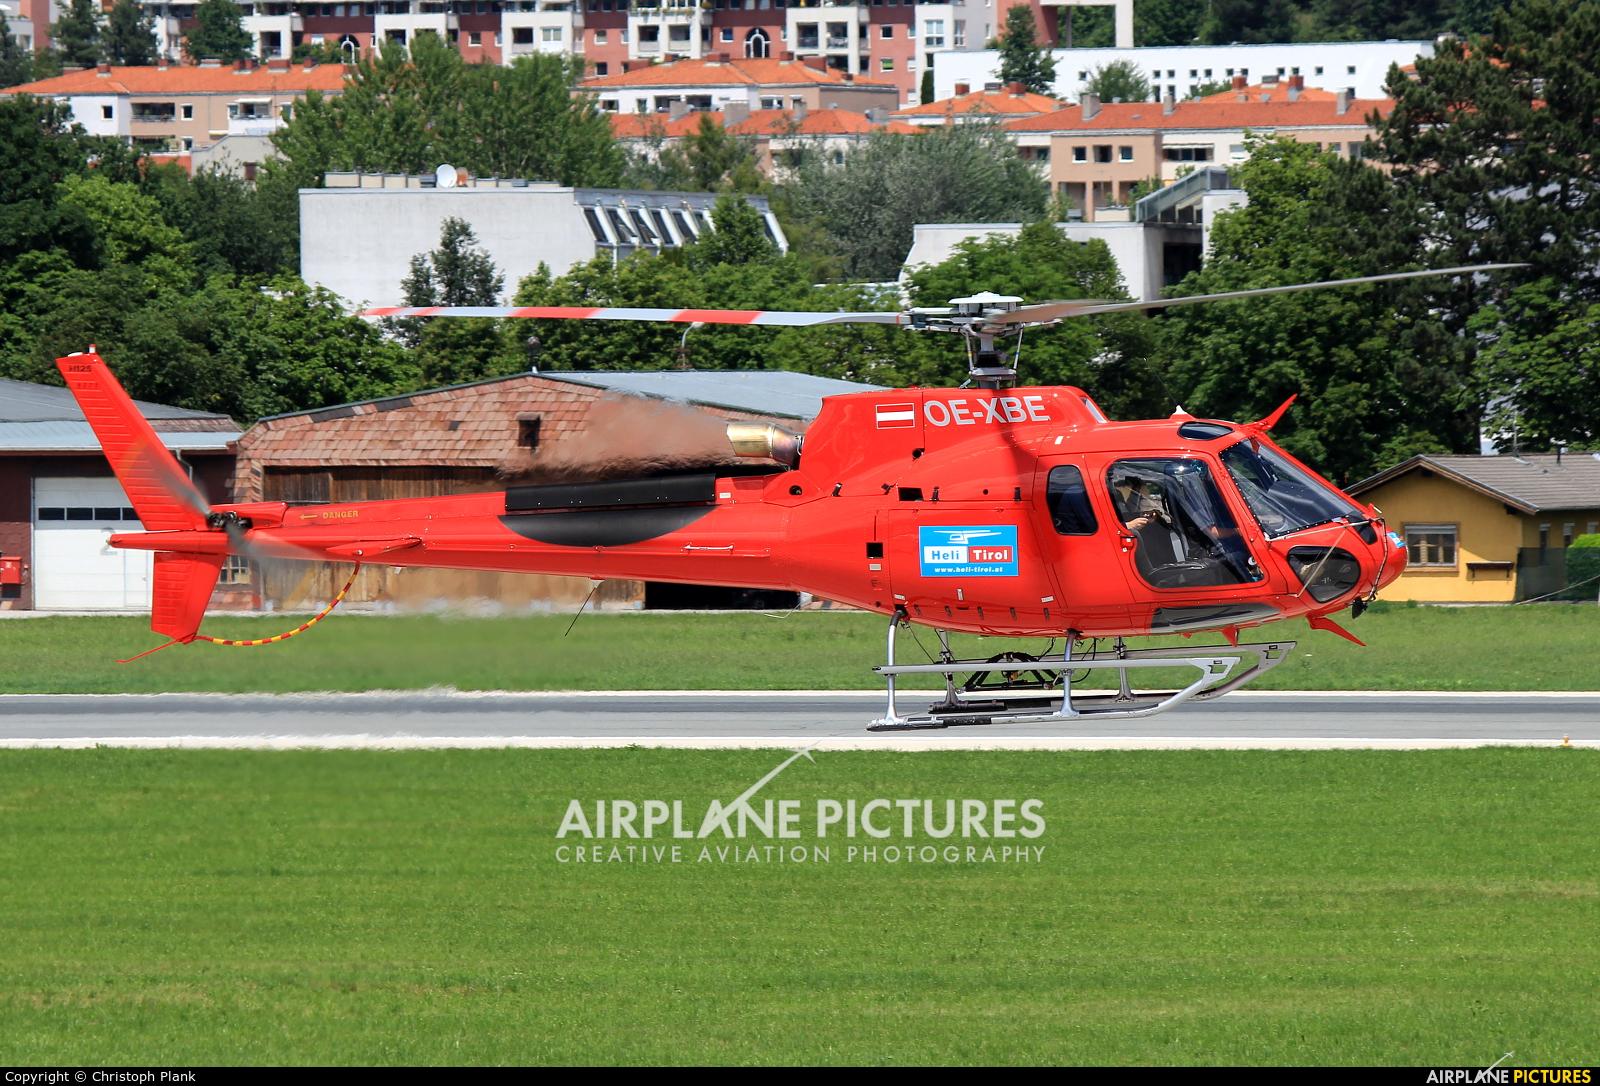 Heli Tirol OE-XBE aircraft at Innsbruck